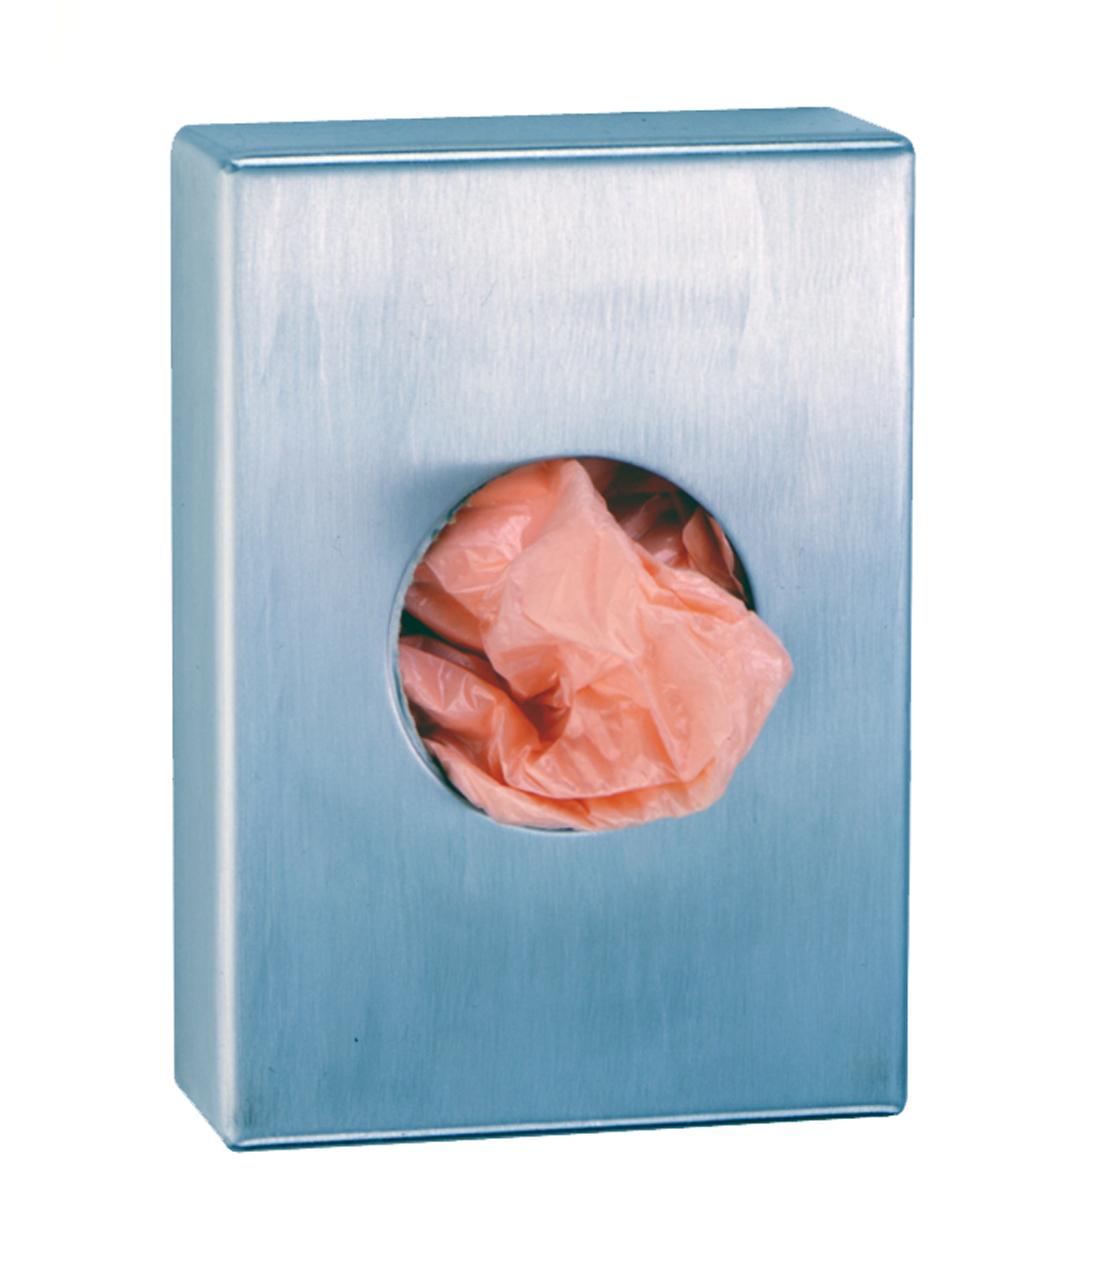 Bobrick Sanitary Disposal Bag Dispenser Bobrick B 3541